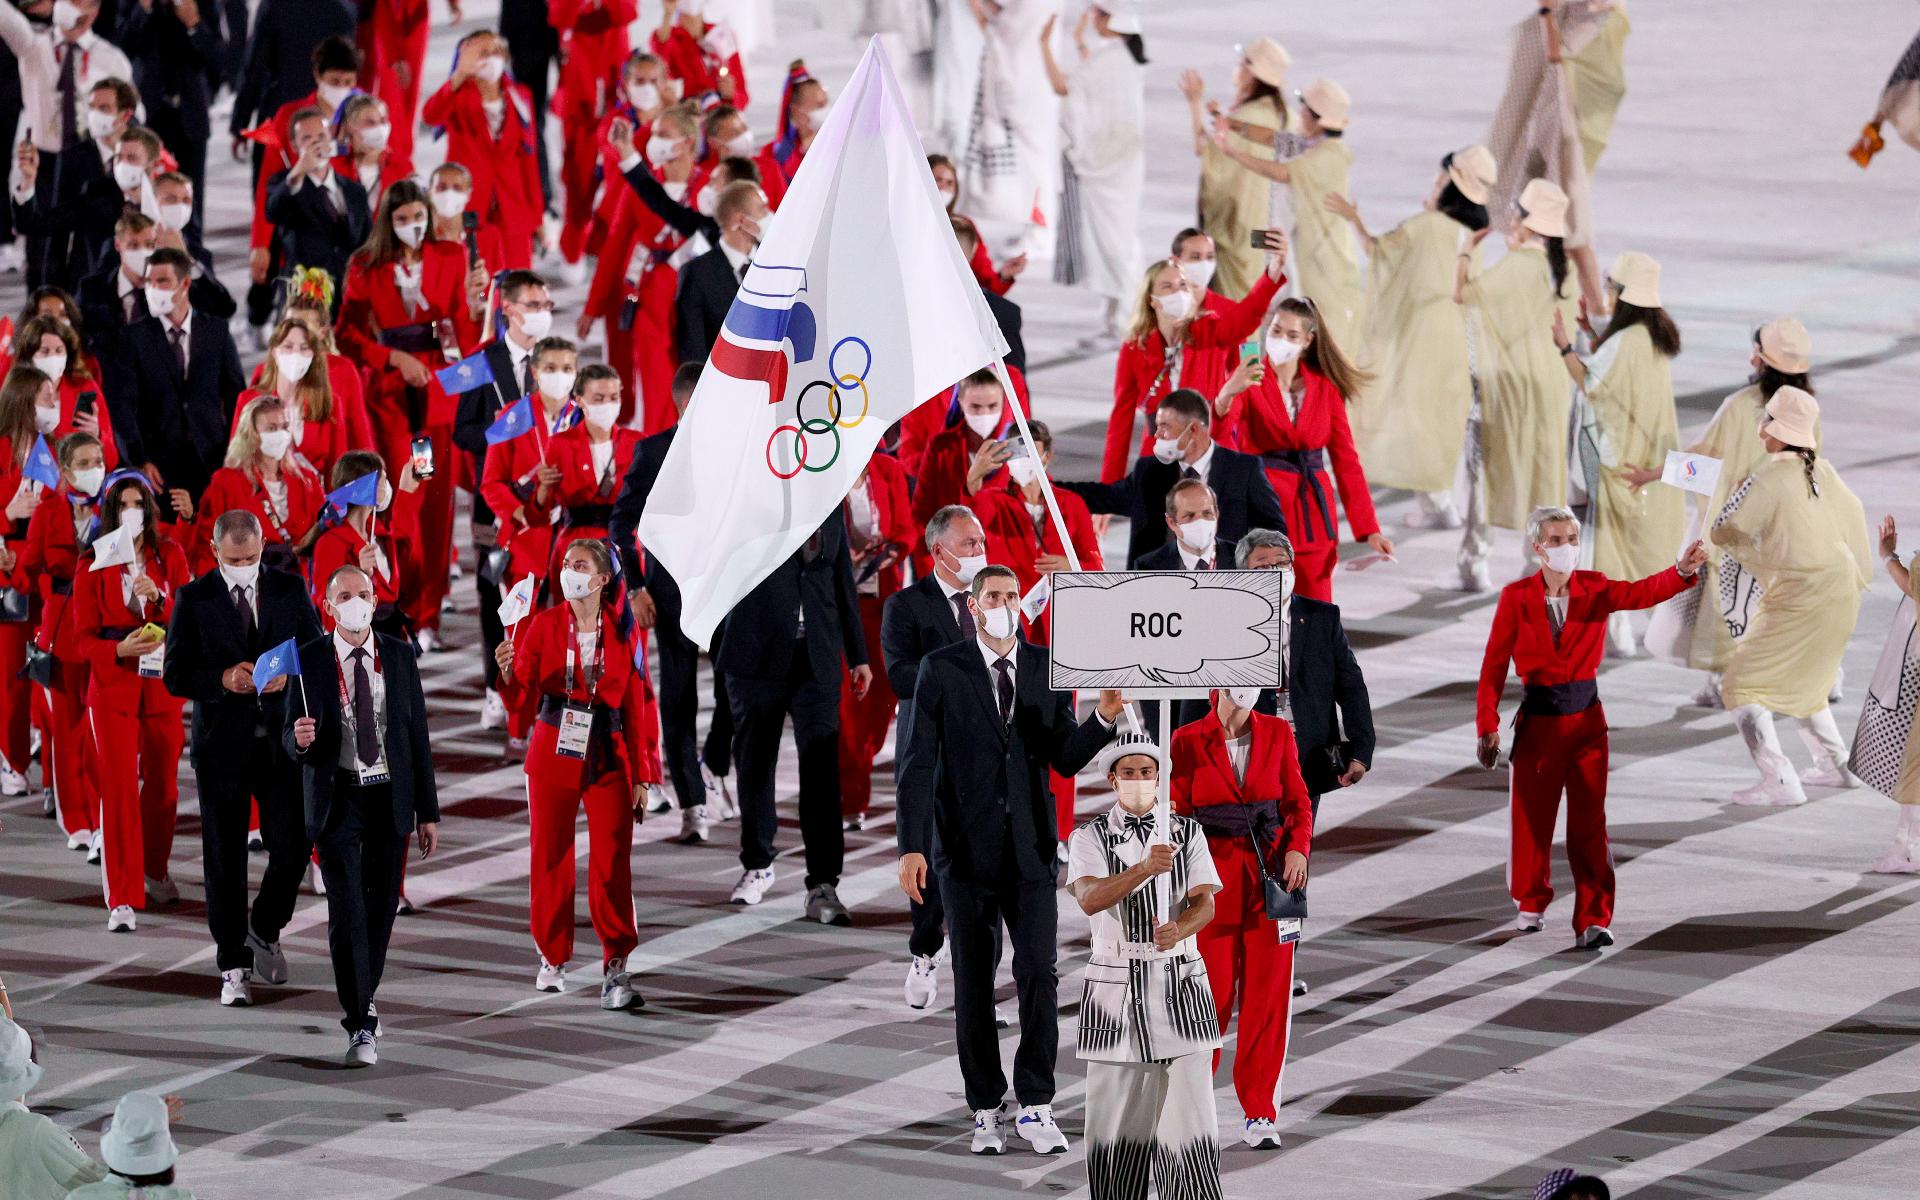 Фото: Сборная России на церемонии открытия Олимпиады в Токио (Photo by Patrick Smith/Getty Images)